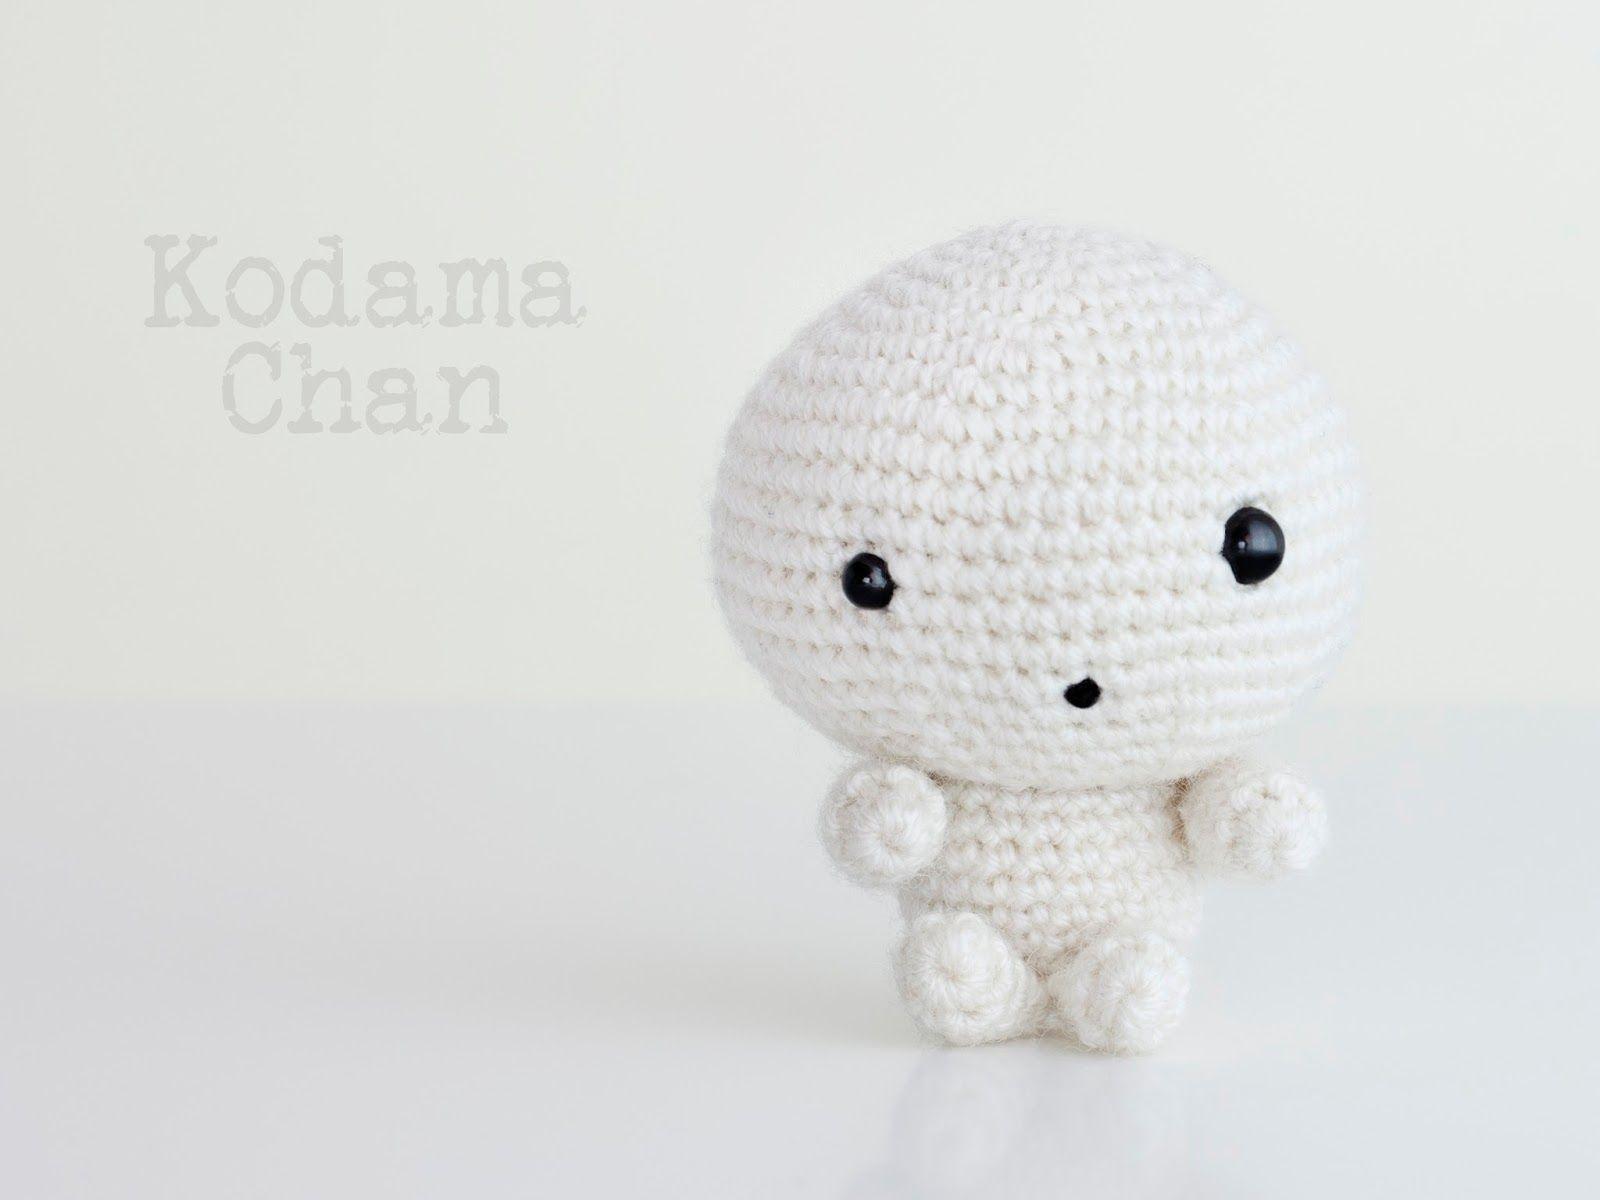 Amigurumi Kodama Chan - FREE Crochet Pattern / Tutorial | Amigurumis ...